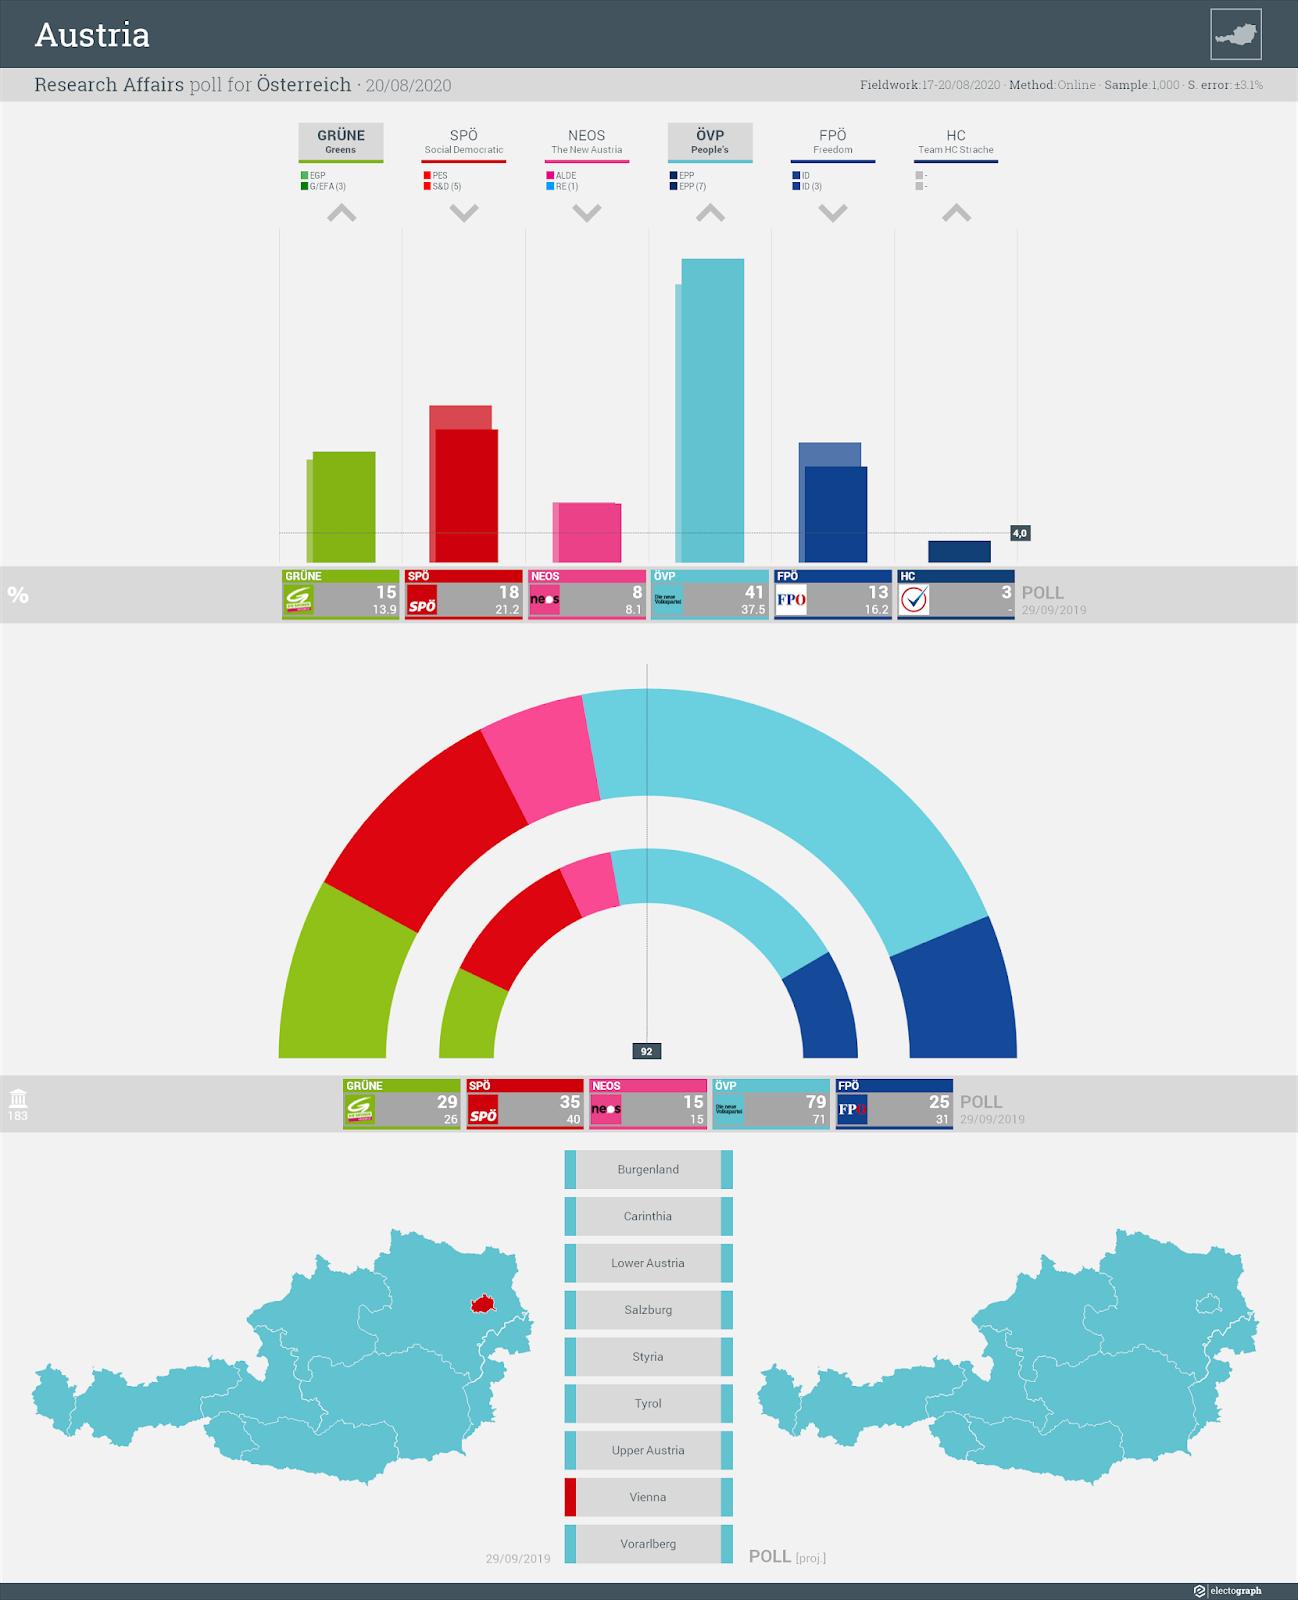 AUSTRIA: Research Affairs poll chart for Österreich, 20 August 2020